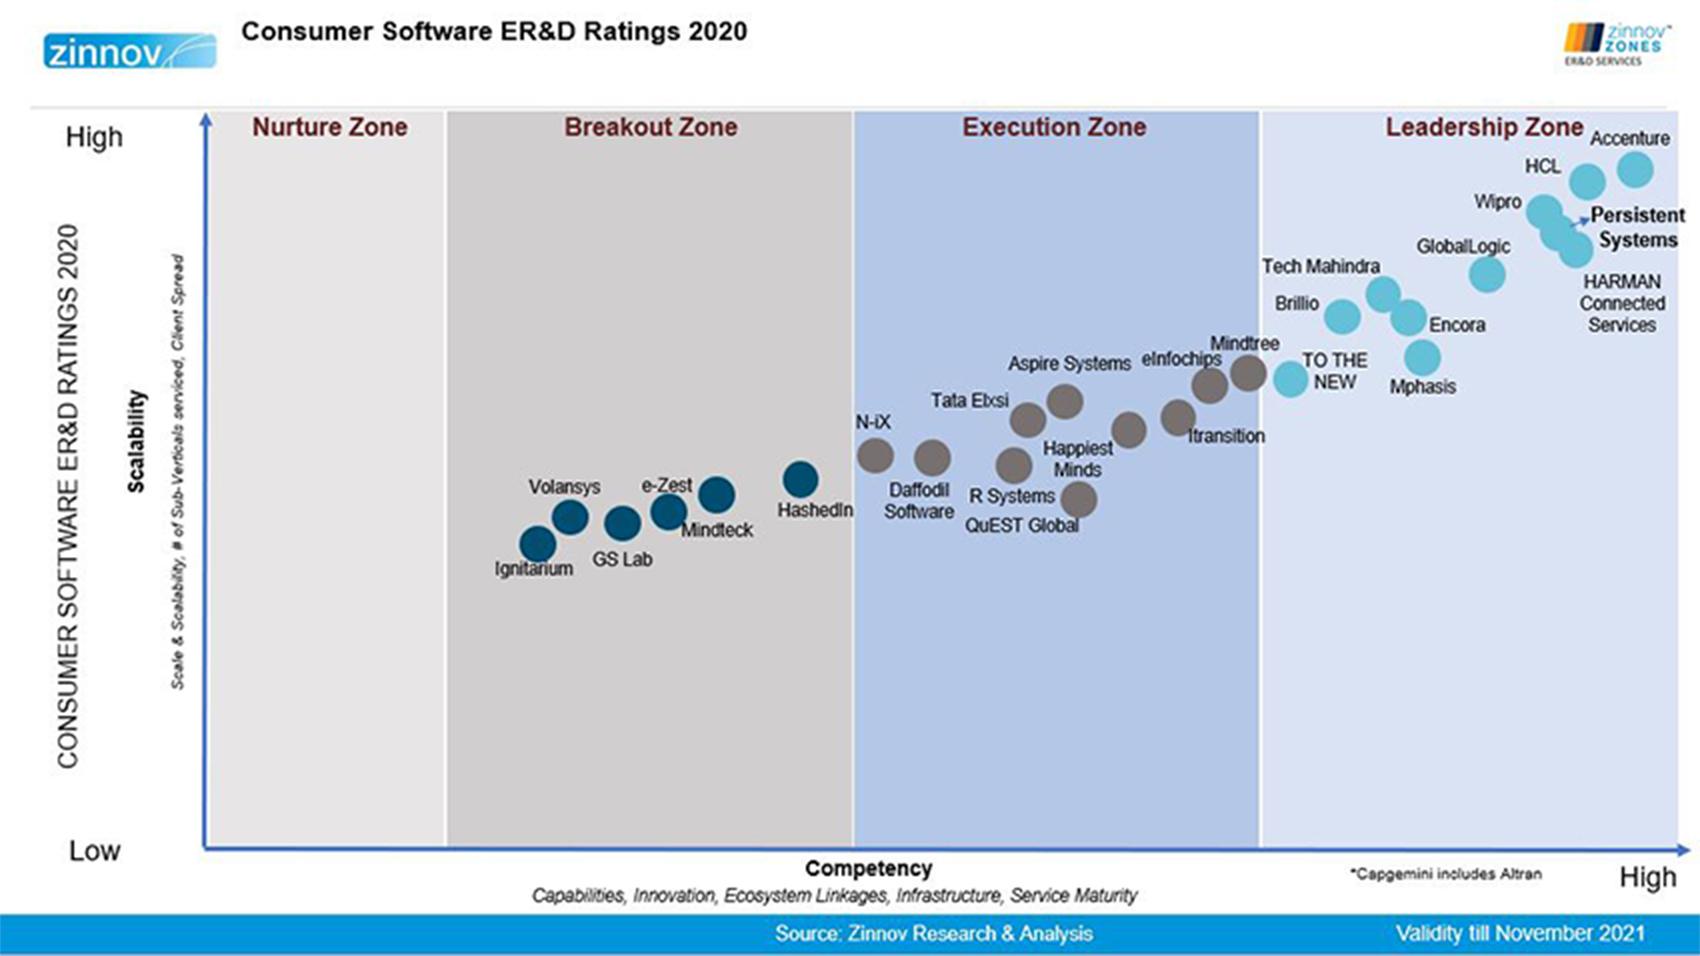 Consumer software ERD ratings